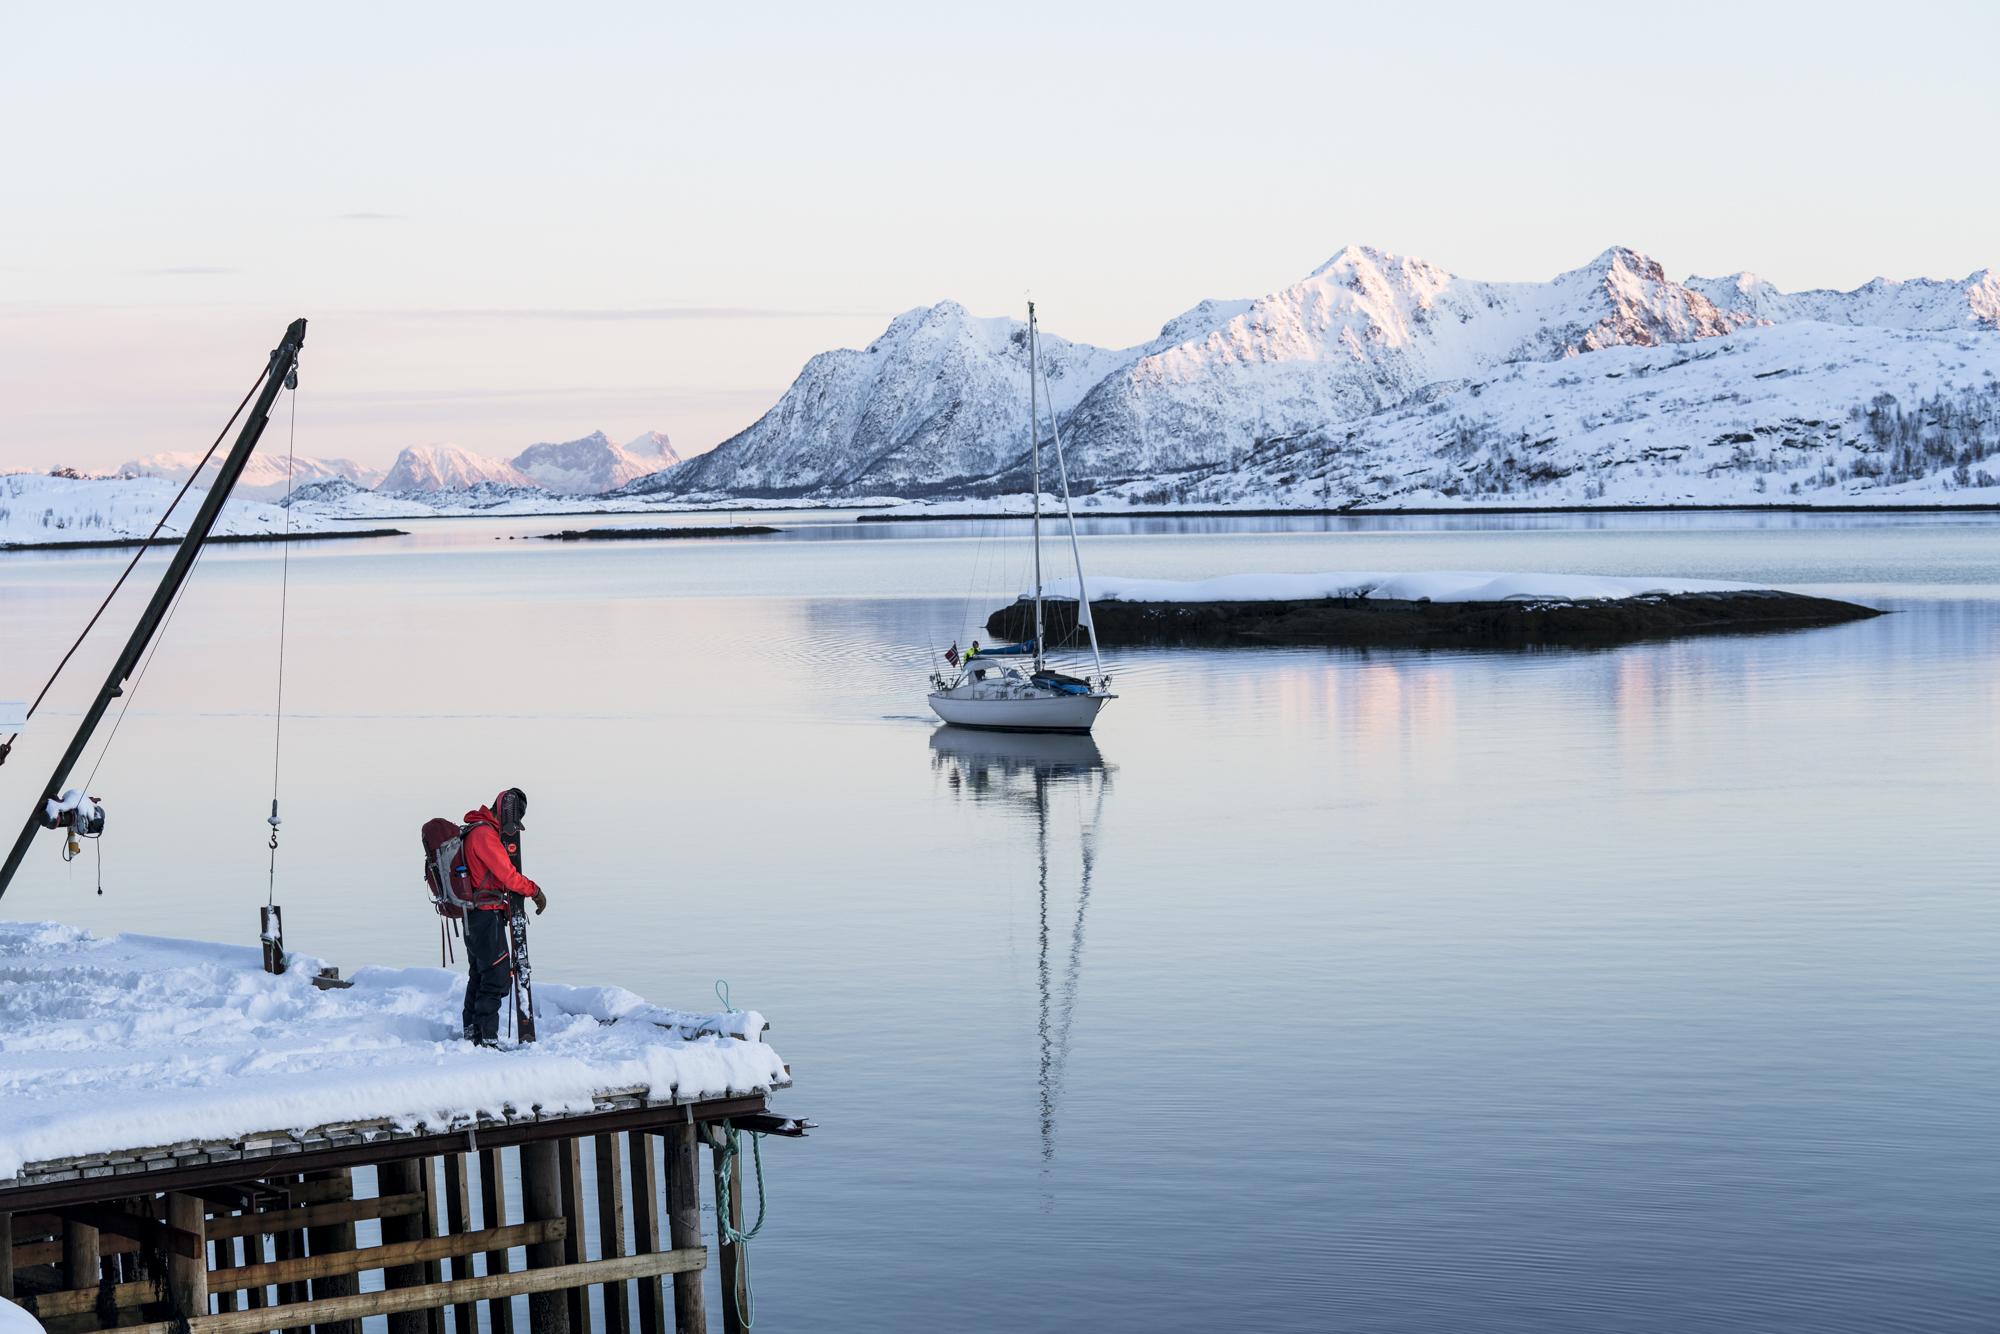 20180313_Vatterfjord_KyrreBuxrud_004.jpg